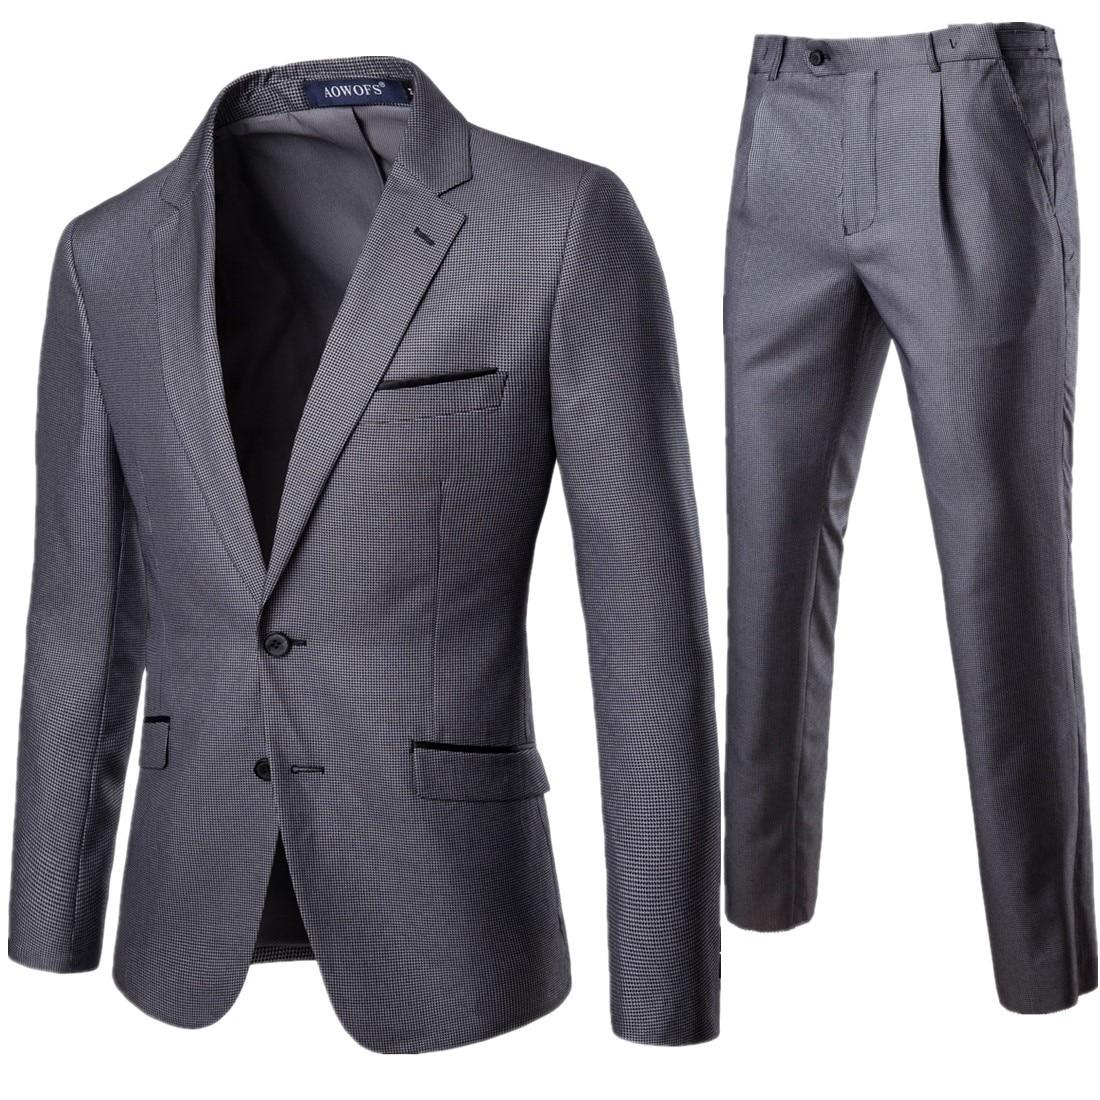 Lotte Men Suit 2 Pieces Business Formal Wear Suit Best Man Groom Marriage Formal Dress Xf011